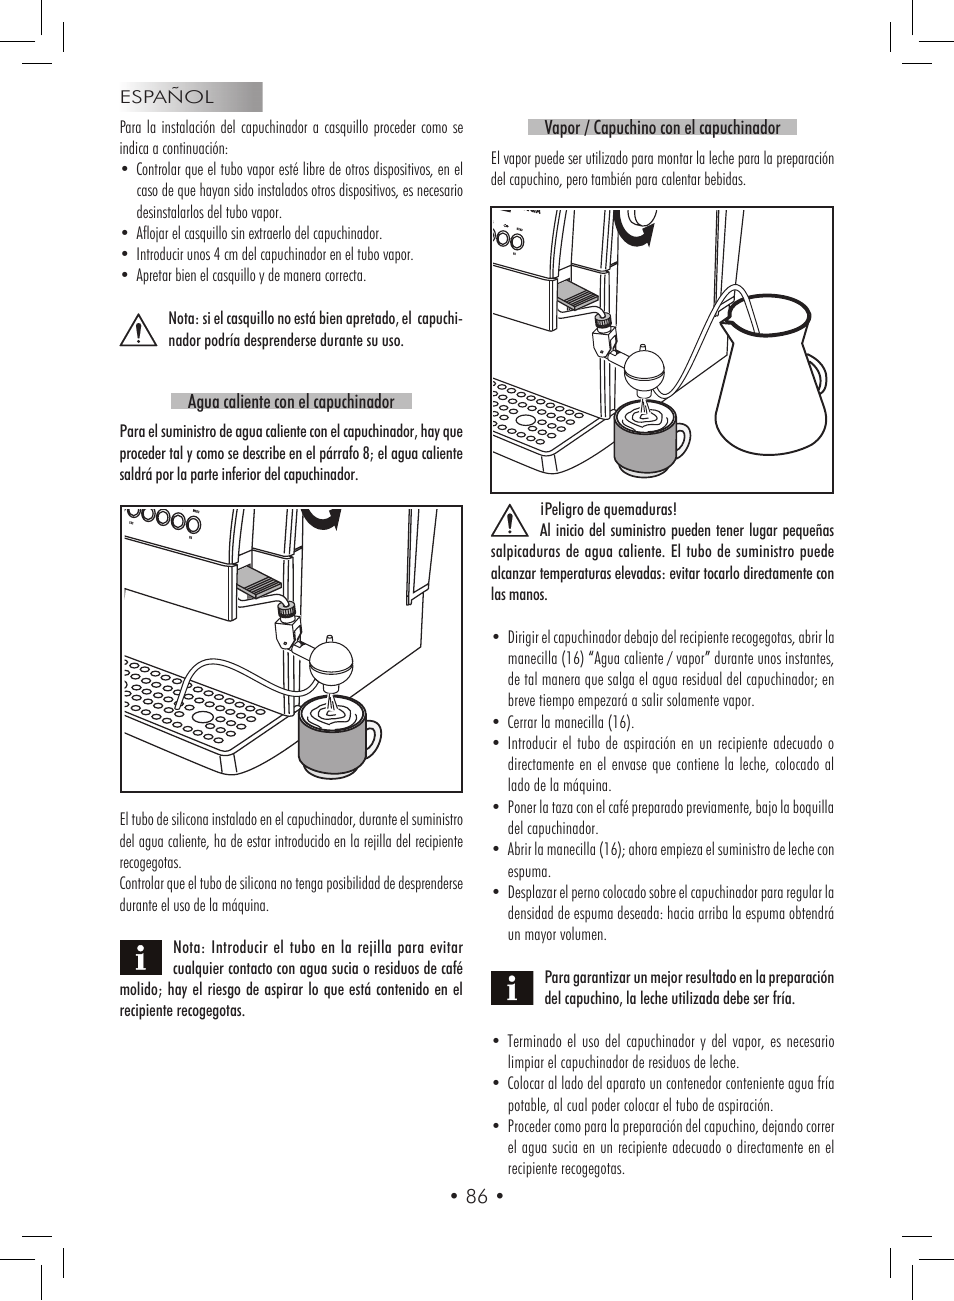 gaggia titanium user manual page 86 132 original mode rh manualsdir com gaggia titanium manuale italiano gaggia titanium manual ventilate